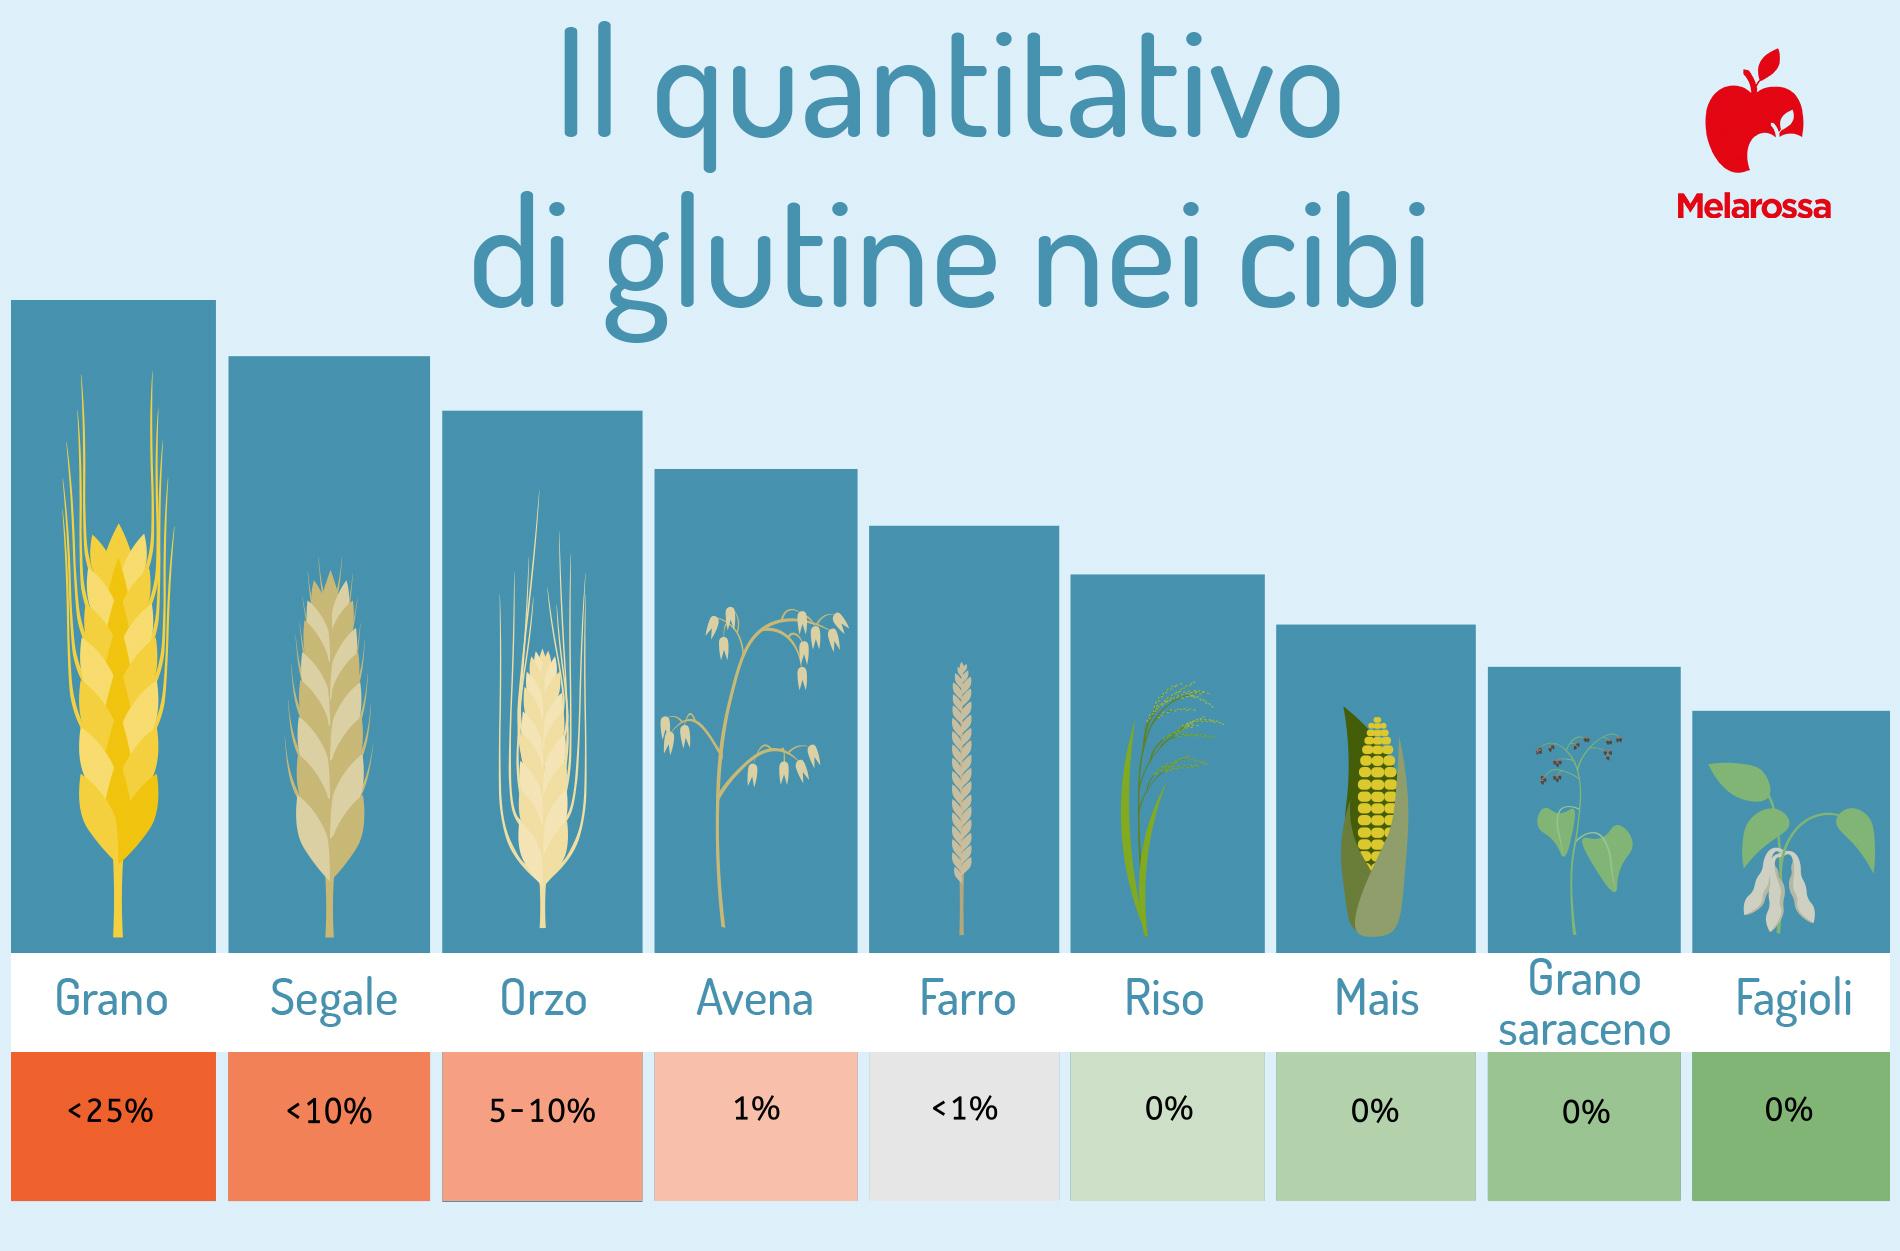 dermatite erpetiforme e glutine